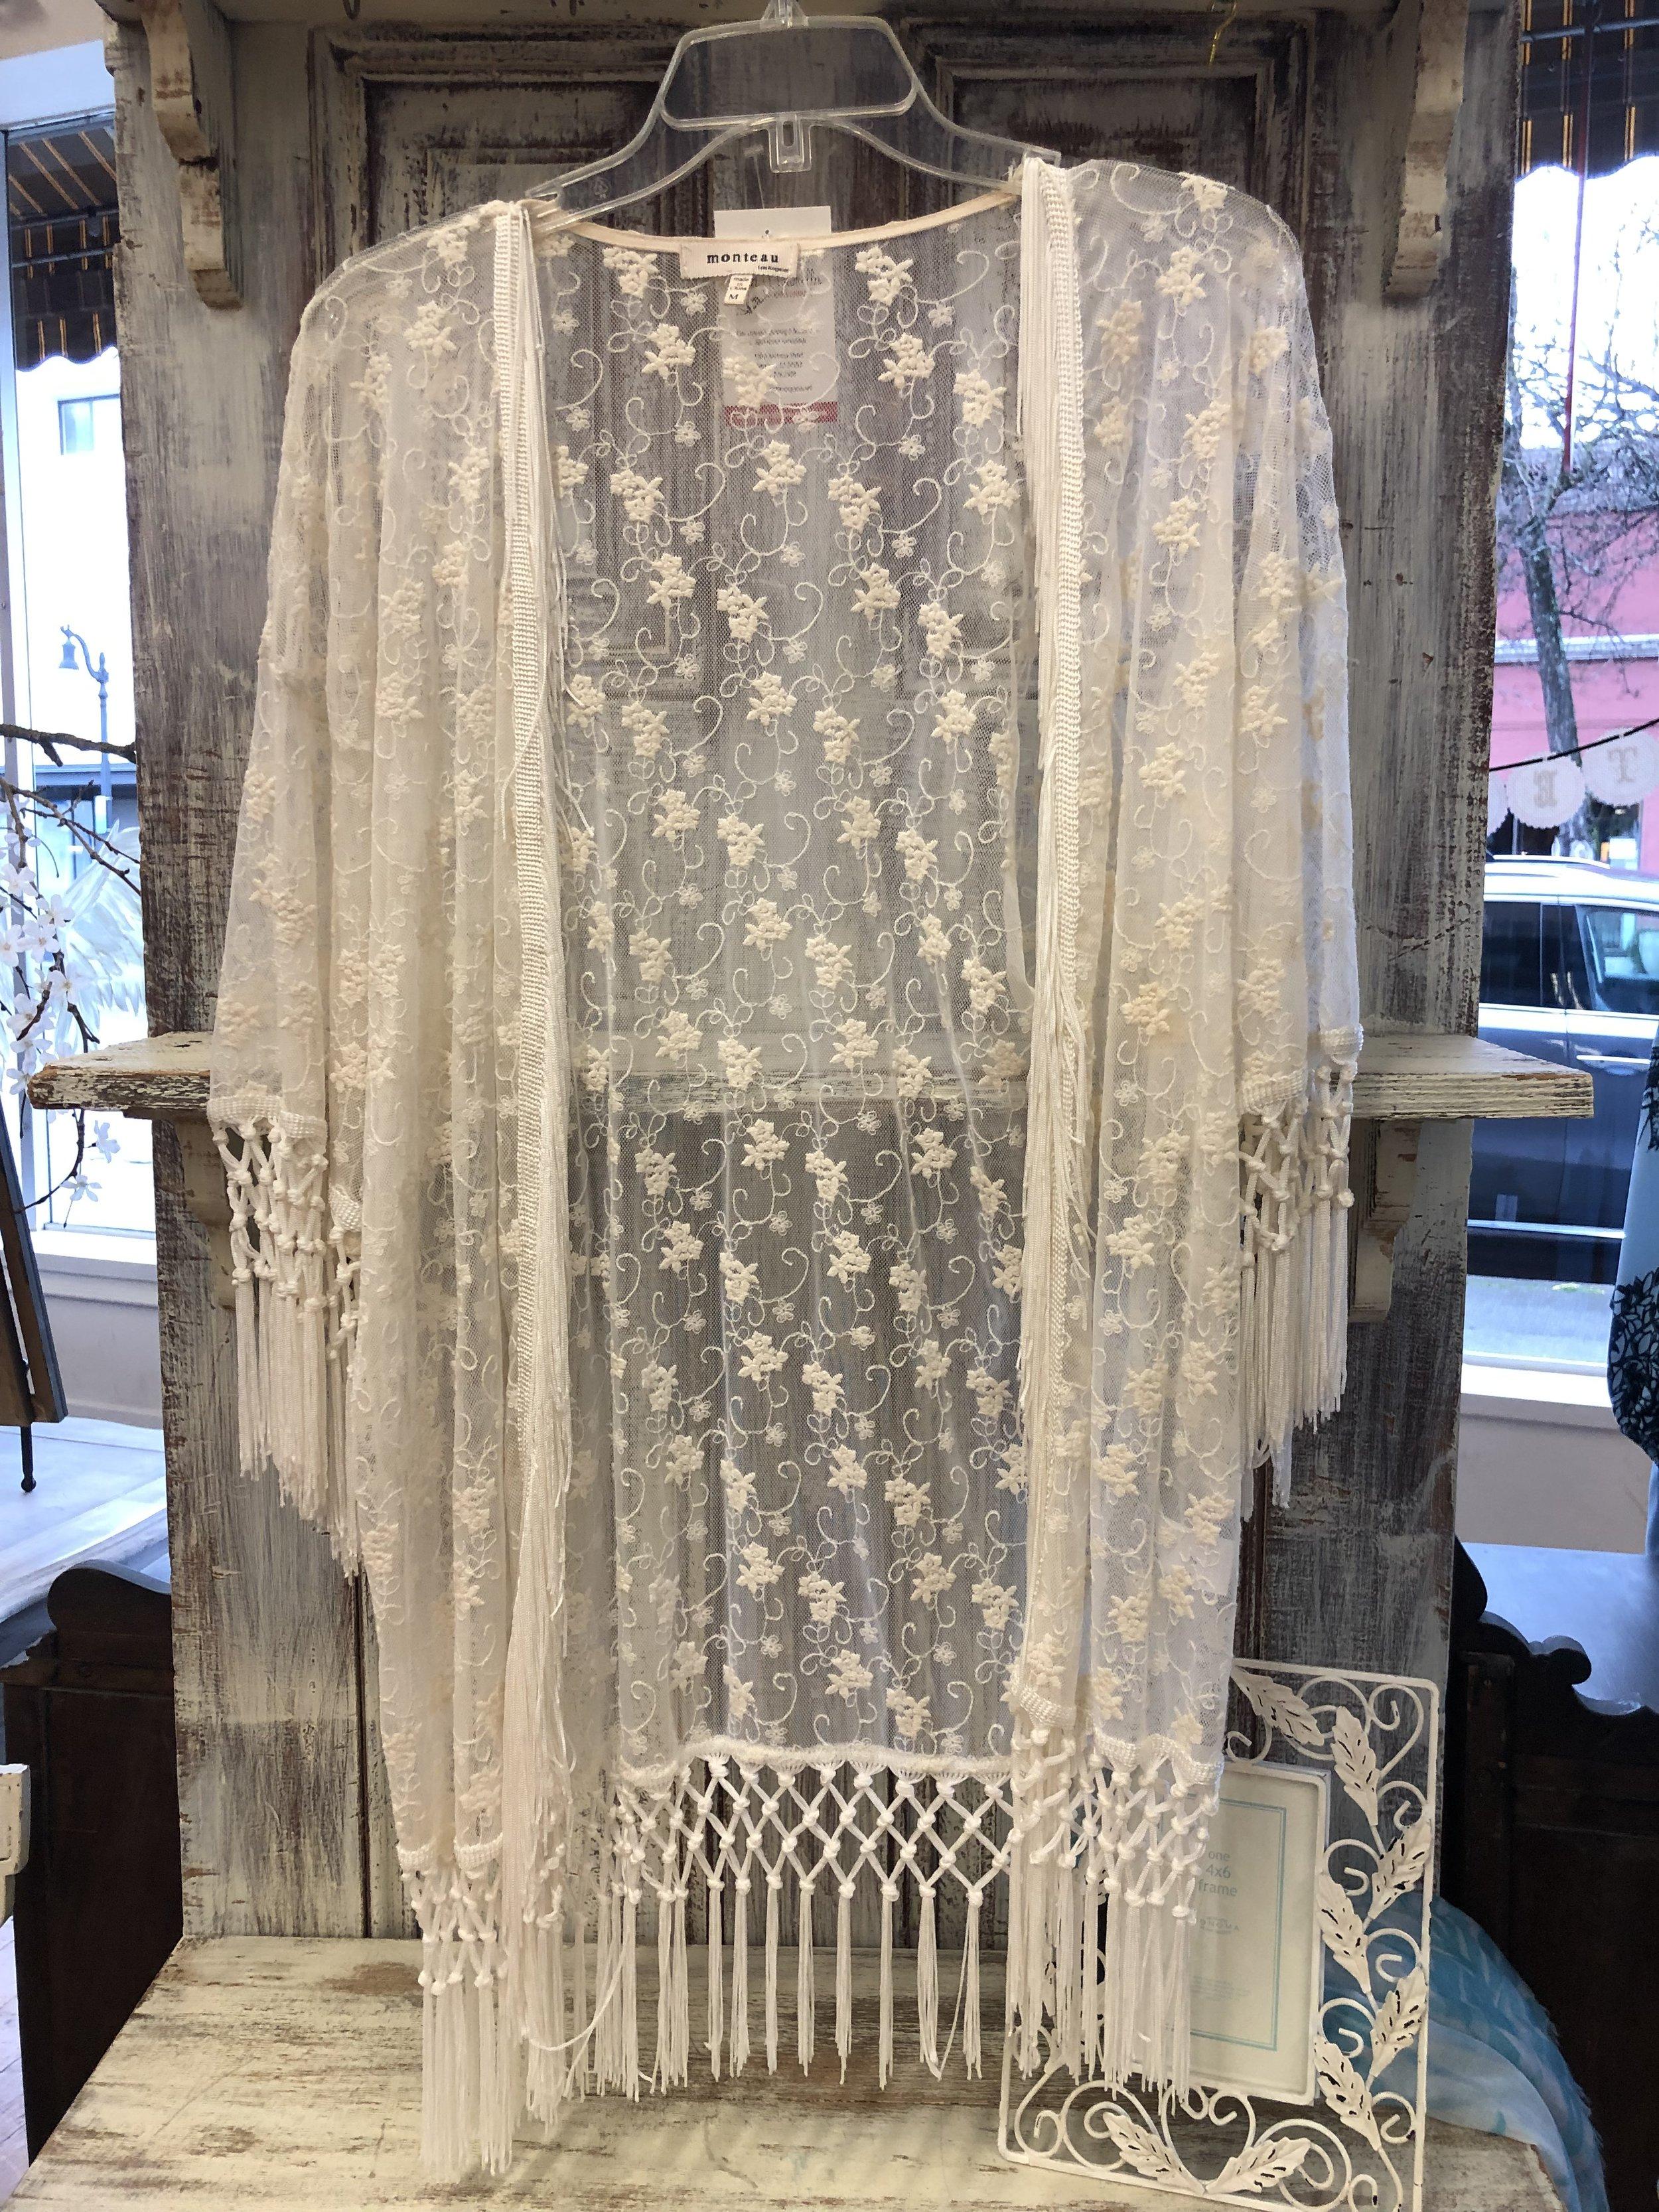 Monteau Lace Kimono - M - $17